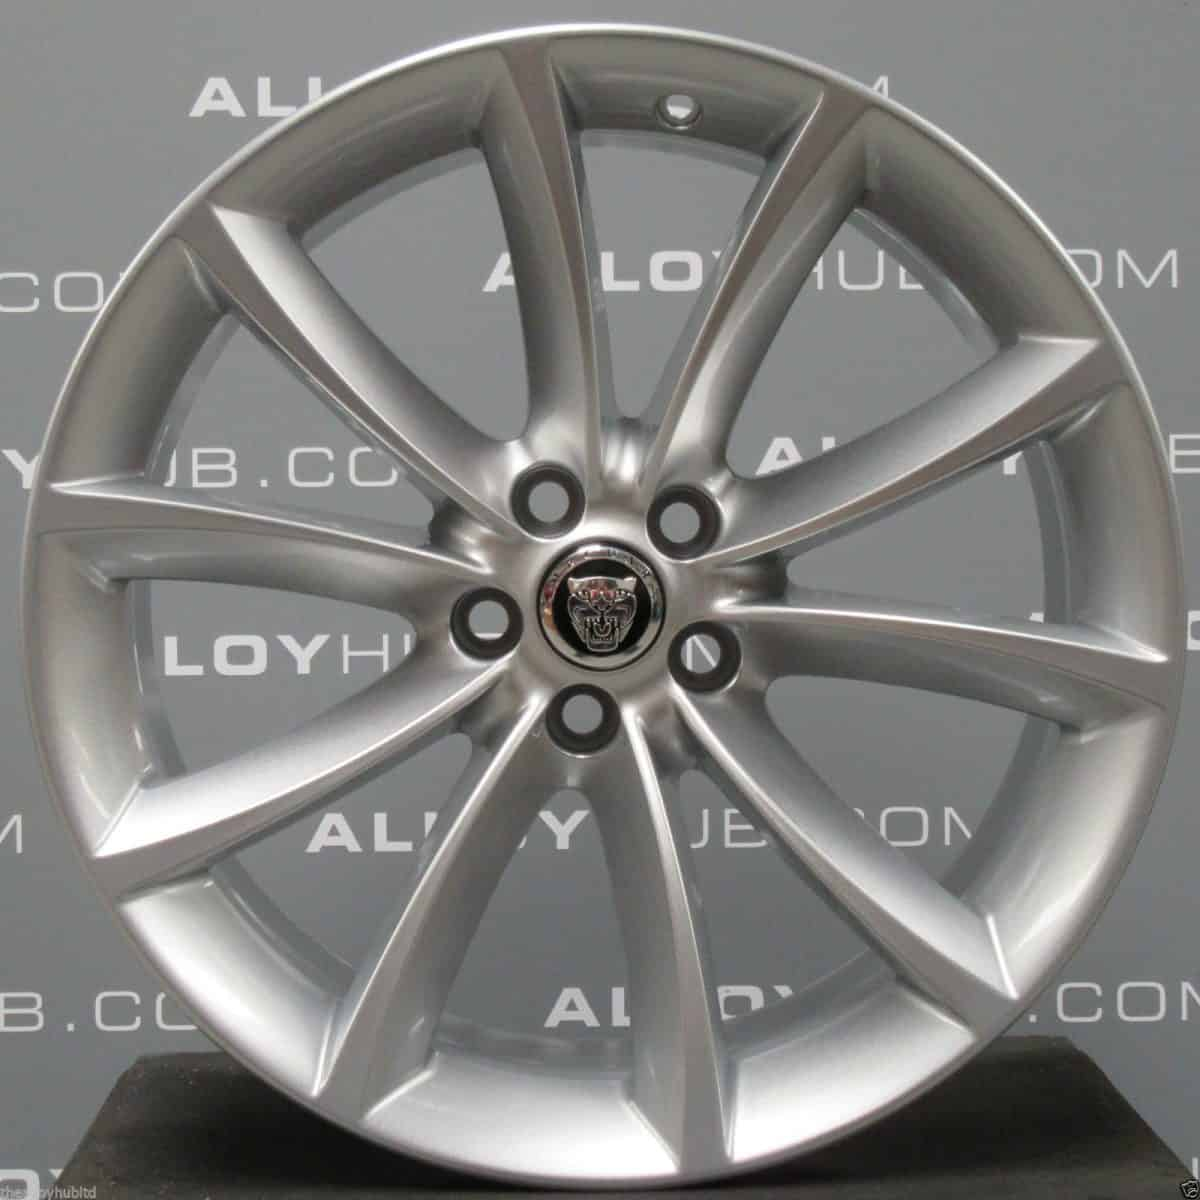 "Genuine Jaguar F-Type Aquila 10 Spoke 19"" inch Alloy Wheels with Silver Finish EX53-1007-CA EX53-1007-DA"